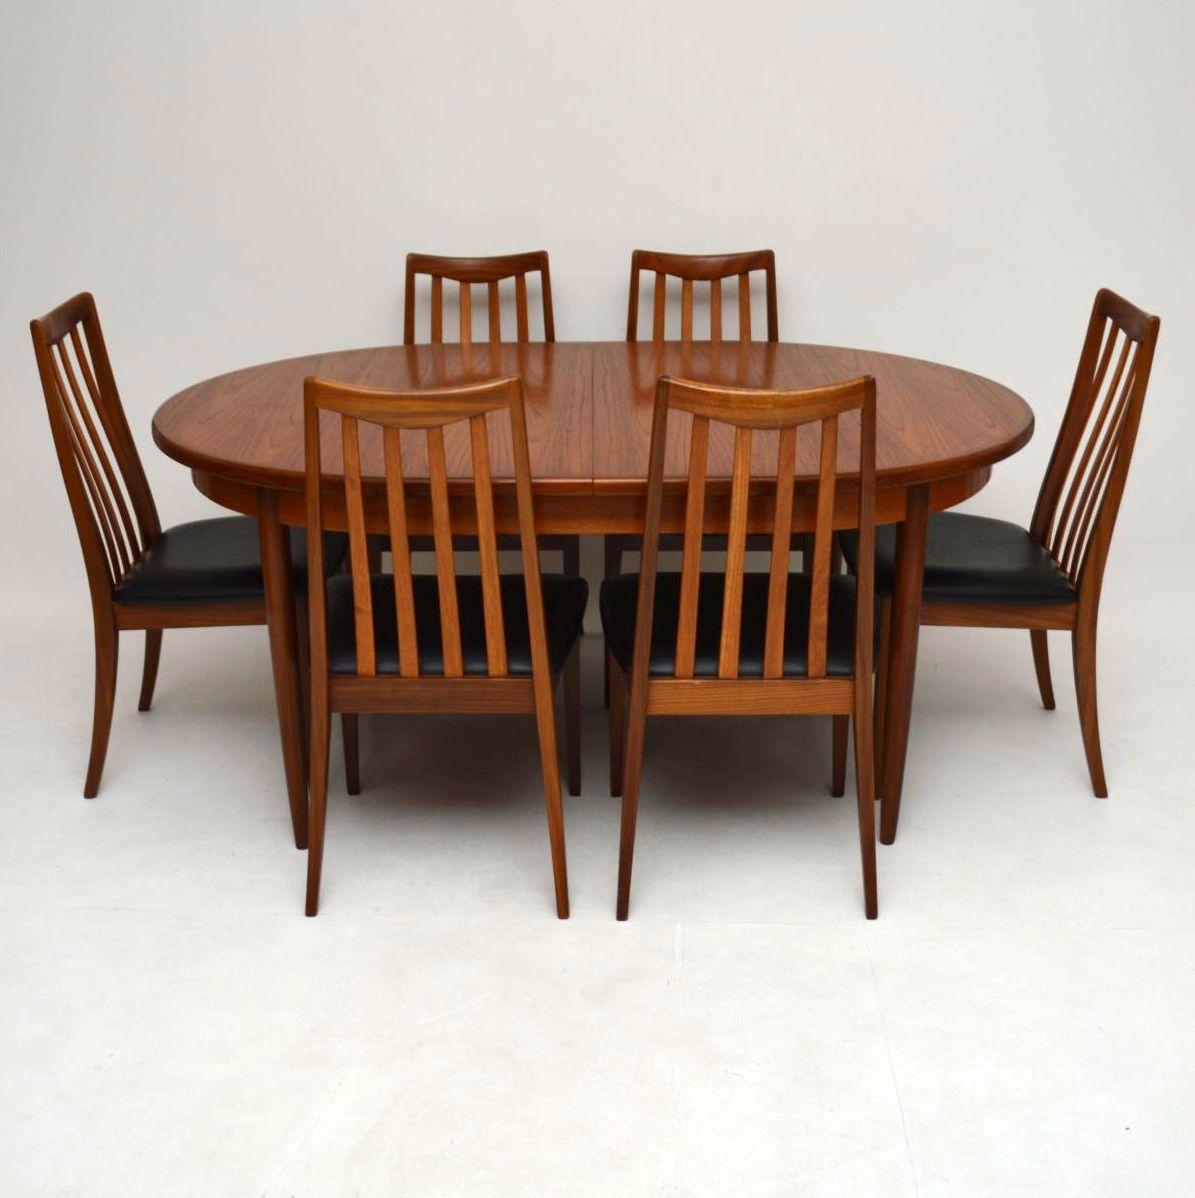 Retro Teak Dining Table amp Six Chairs by G Plan Vintage  : 3917 003 from www.retrospectiveinteriors.com size 1195 x 1198 jpeg 116kB